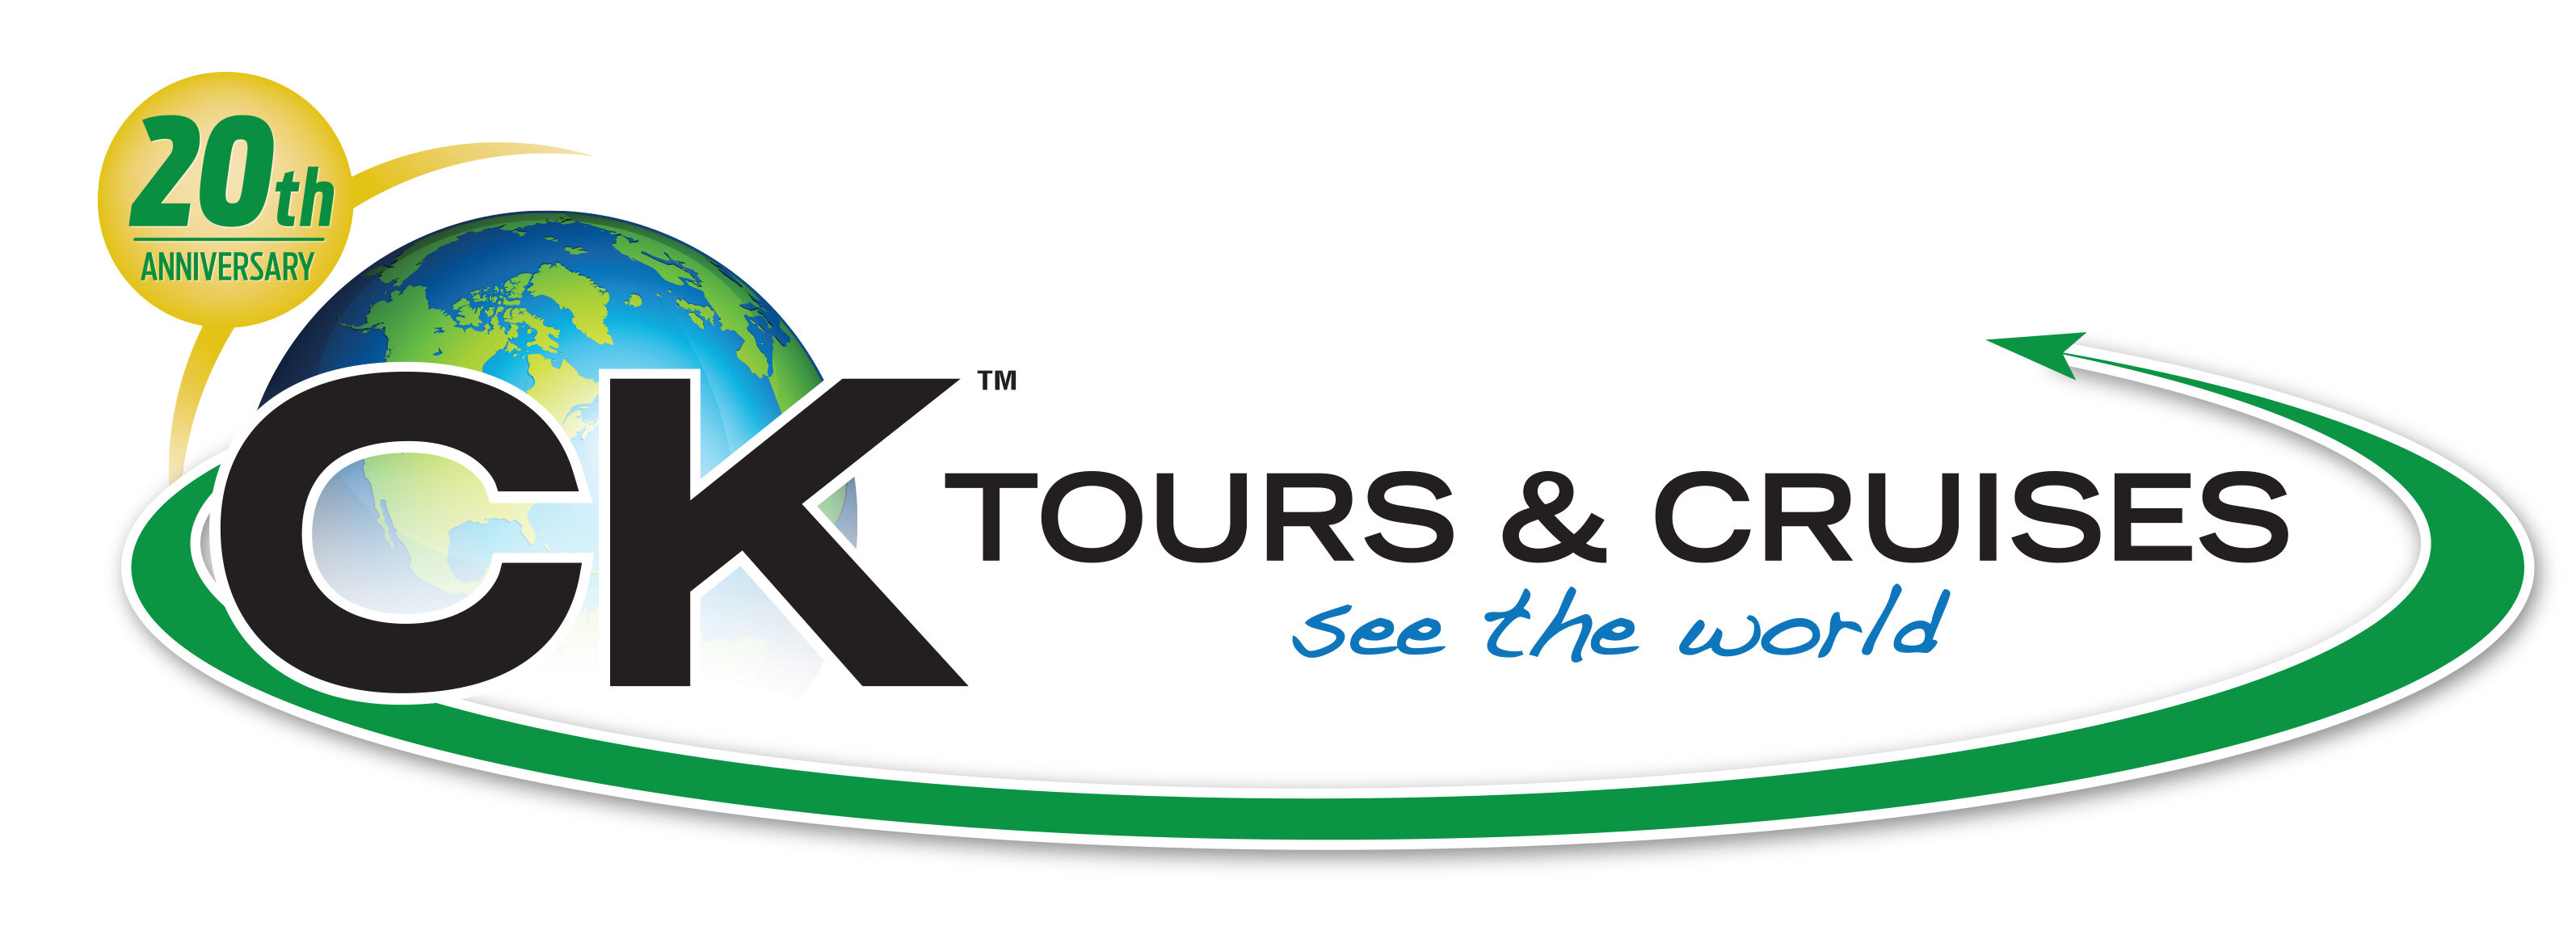 CK Tours & Cruises